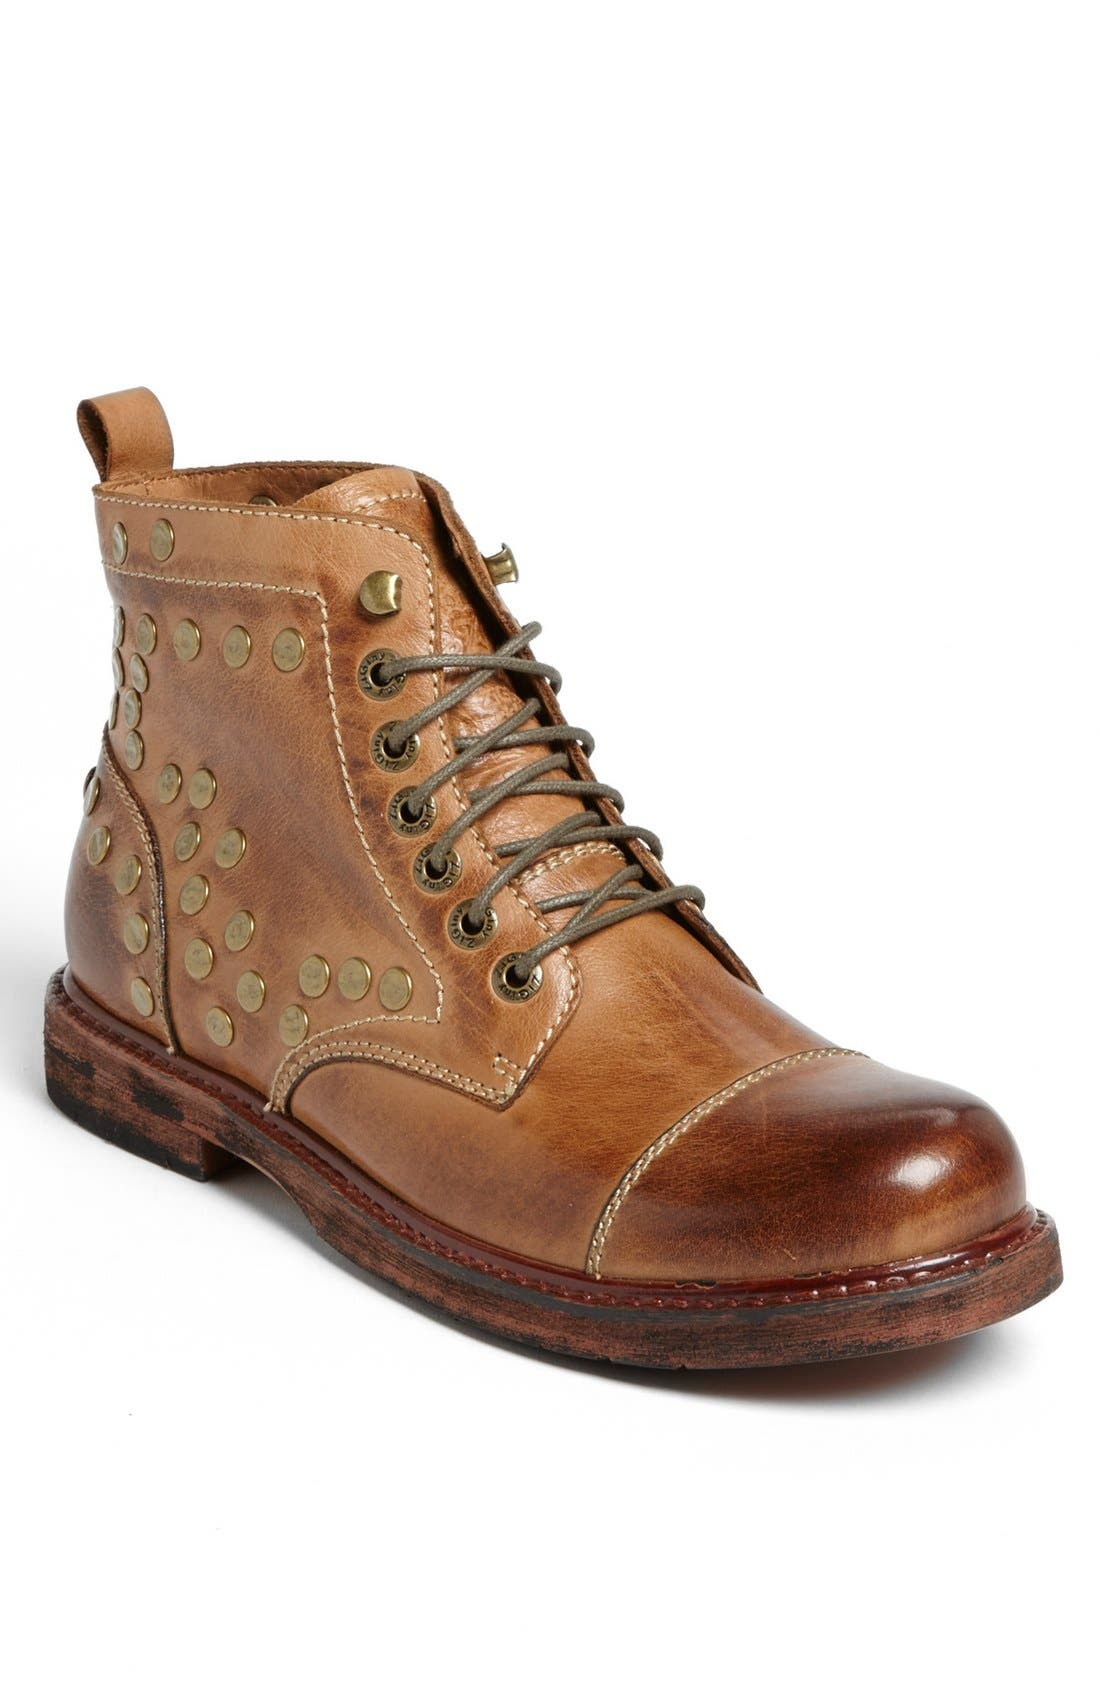 Alternate Image 1 Selected - ZIGIny 'Penn' Cap Toe Boot